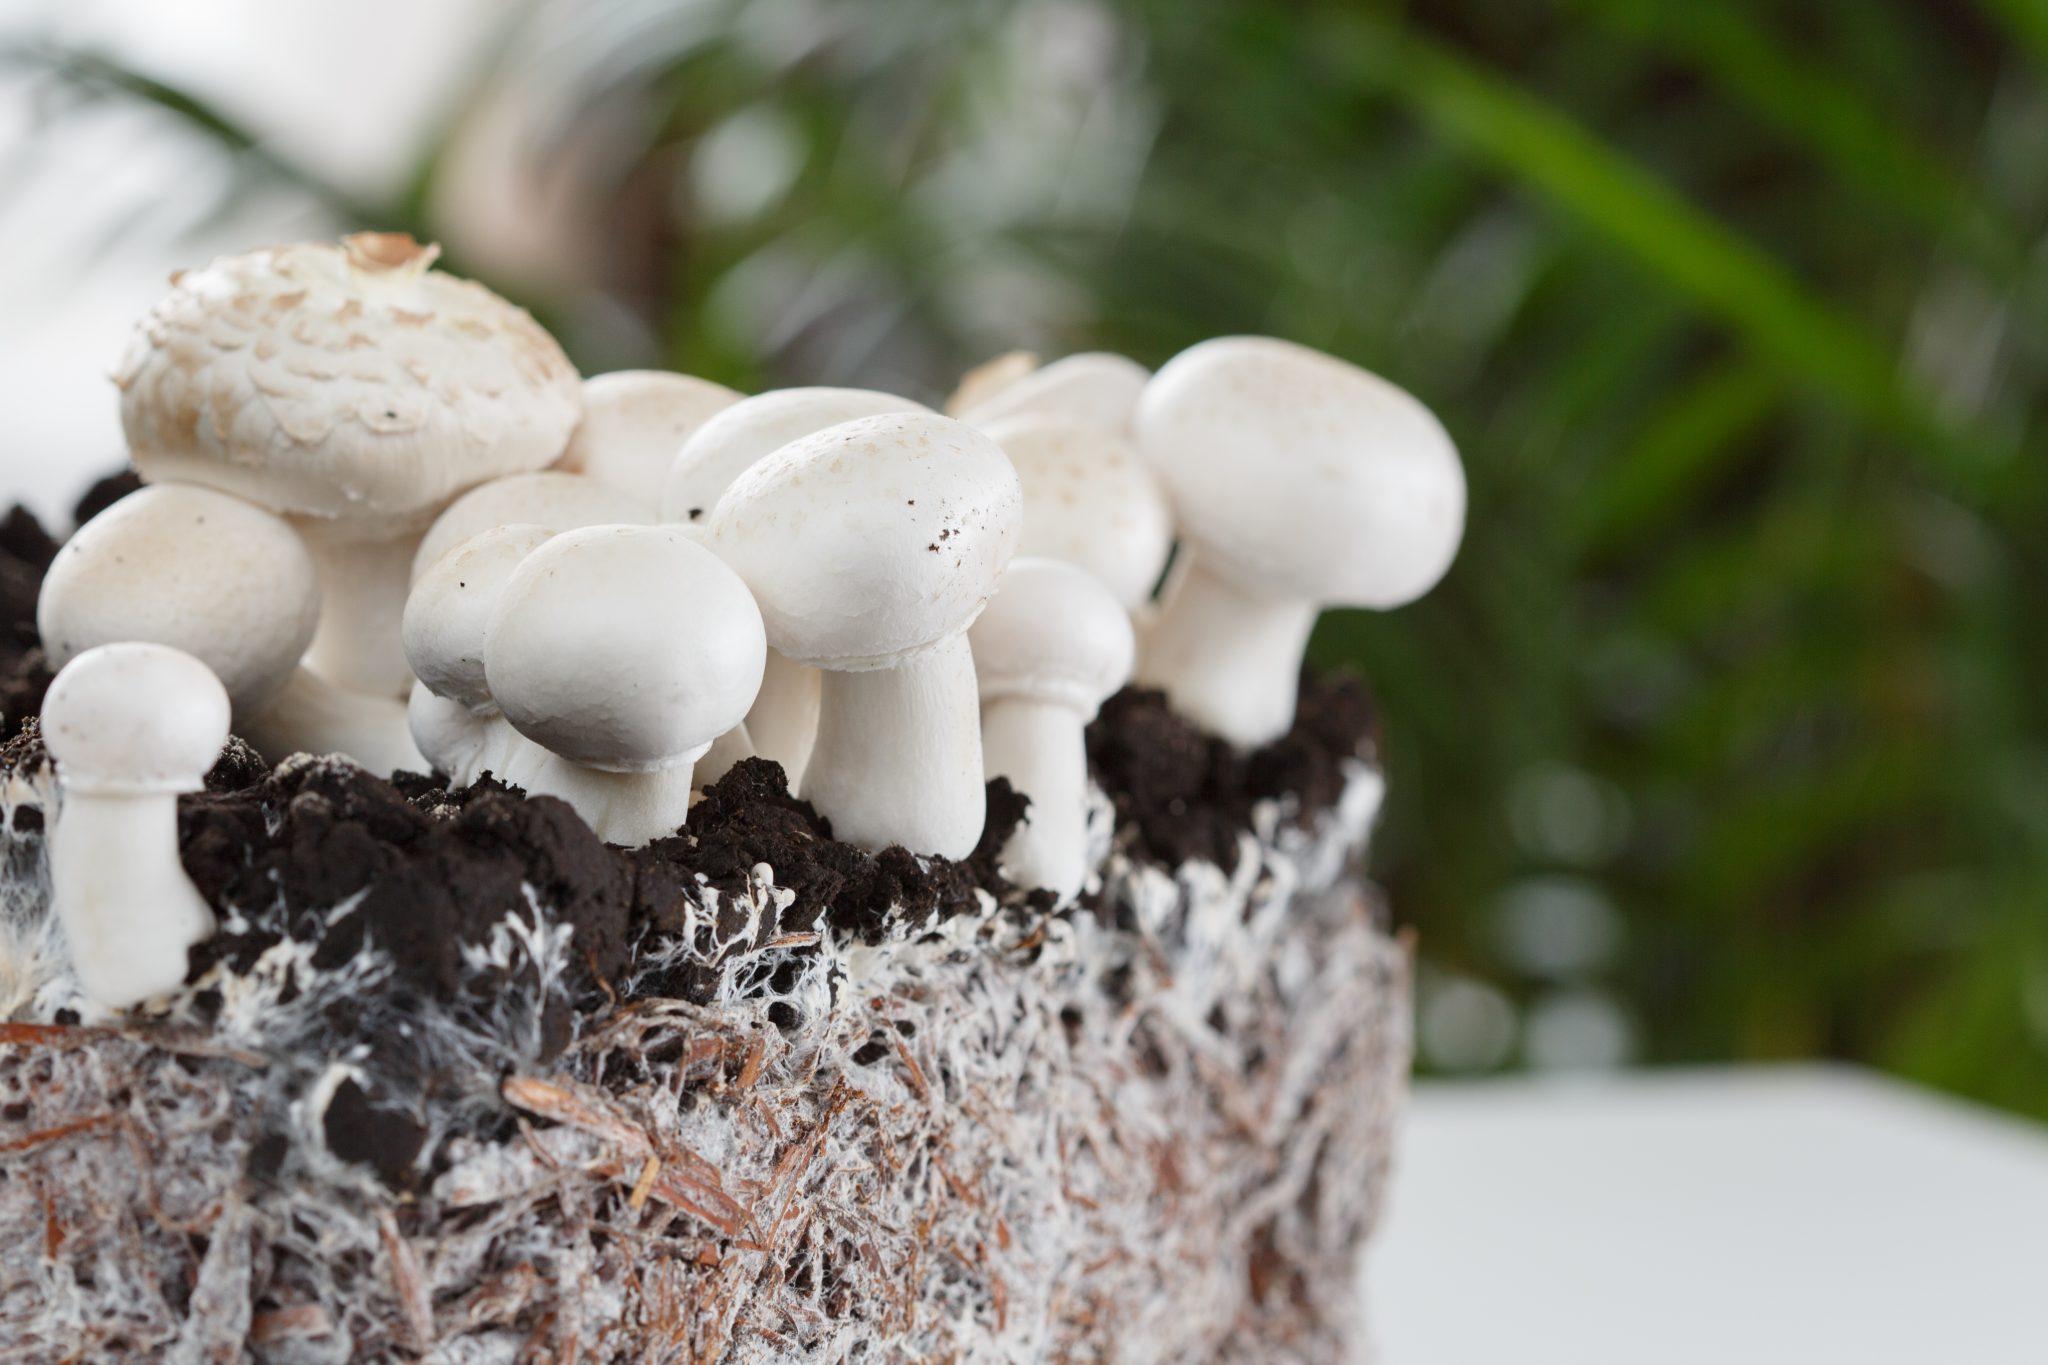 Mycelium: Man's Unexpected Best Friend